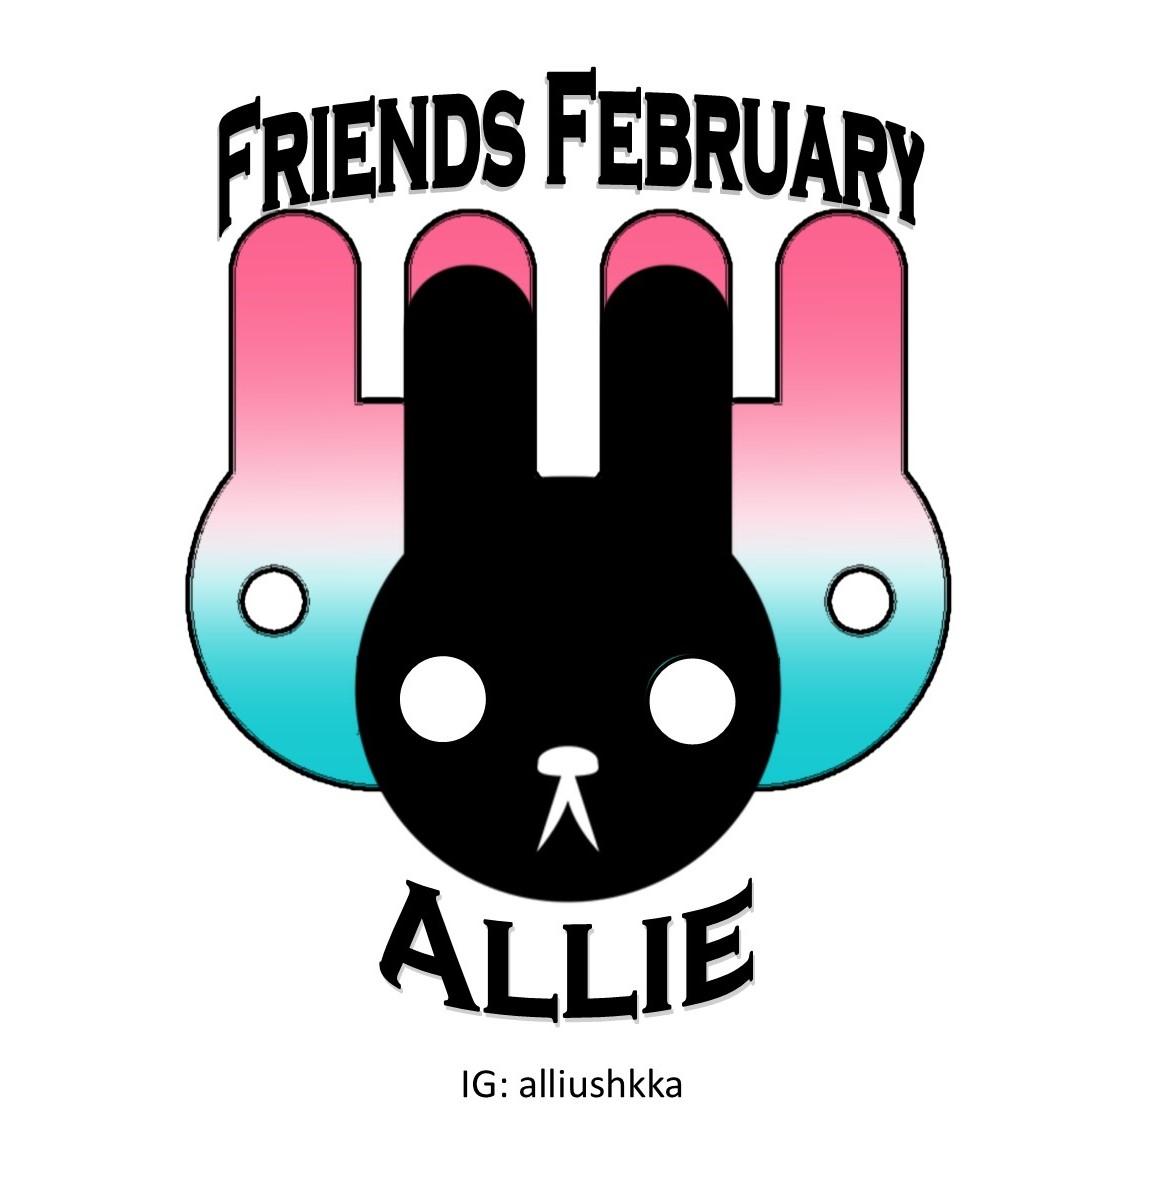 FF Allie.jpg